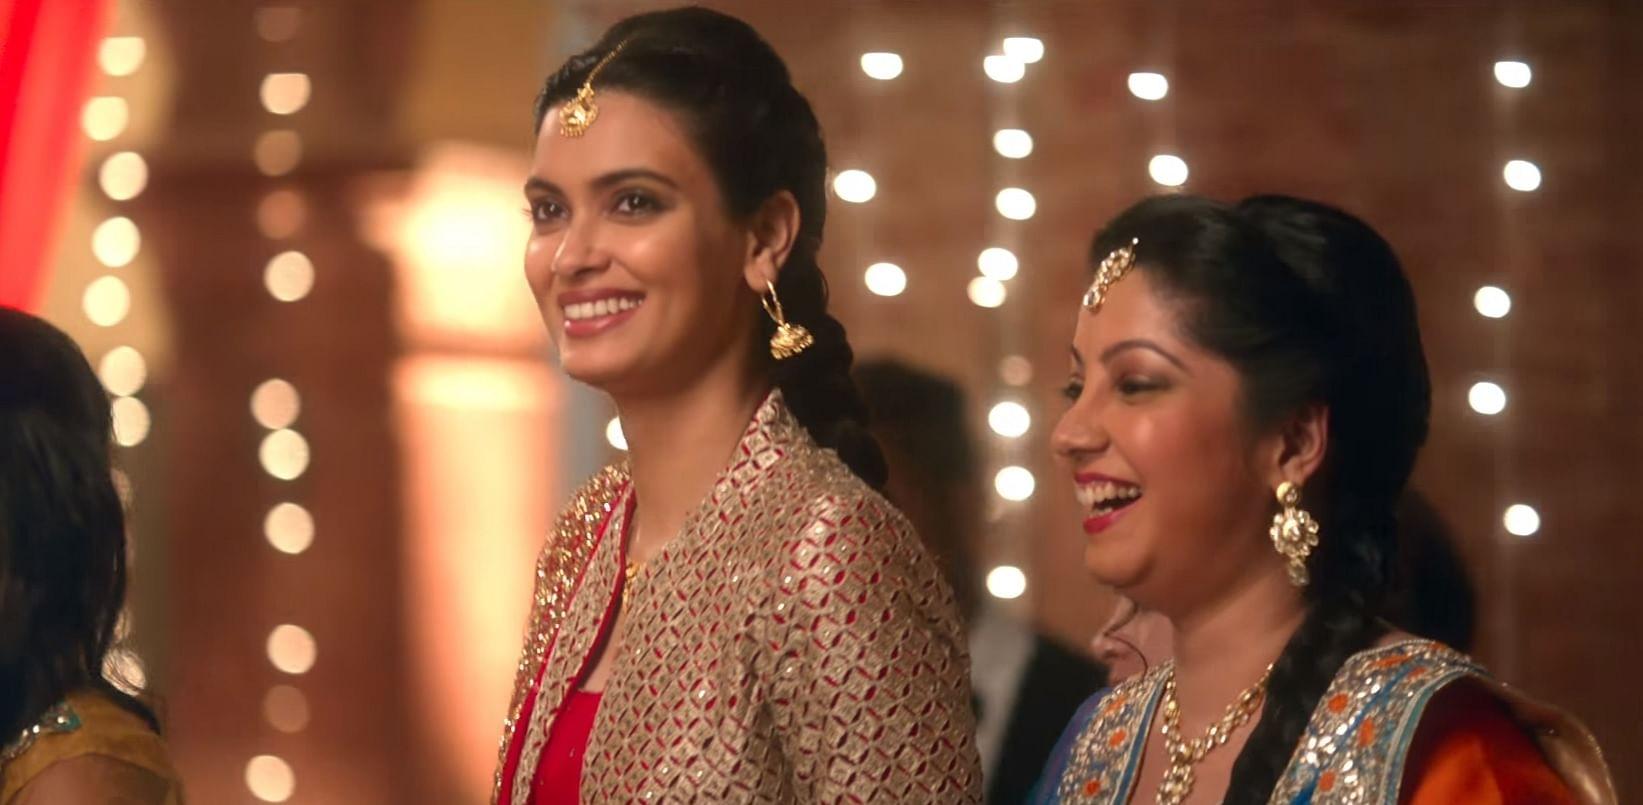 Aashiq Tera Official Video Song Hindi News Aashiq Tera Official